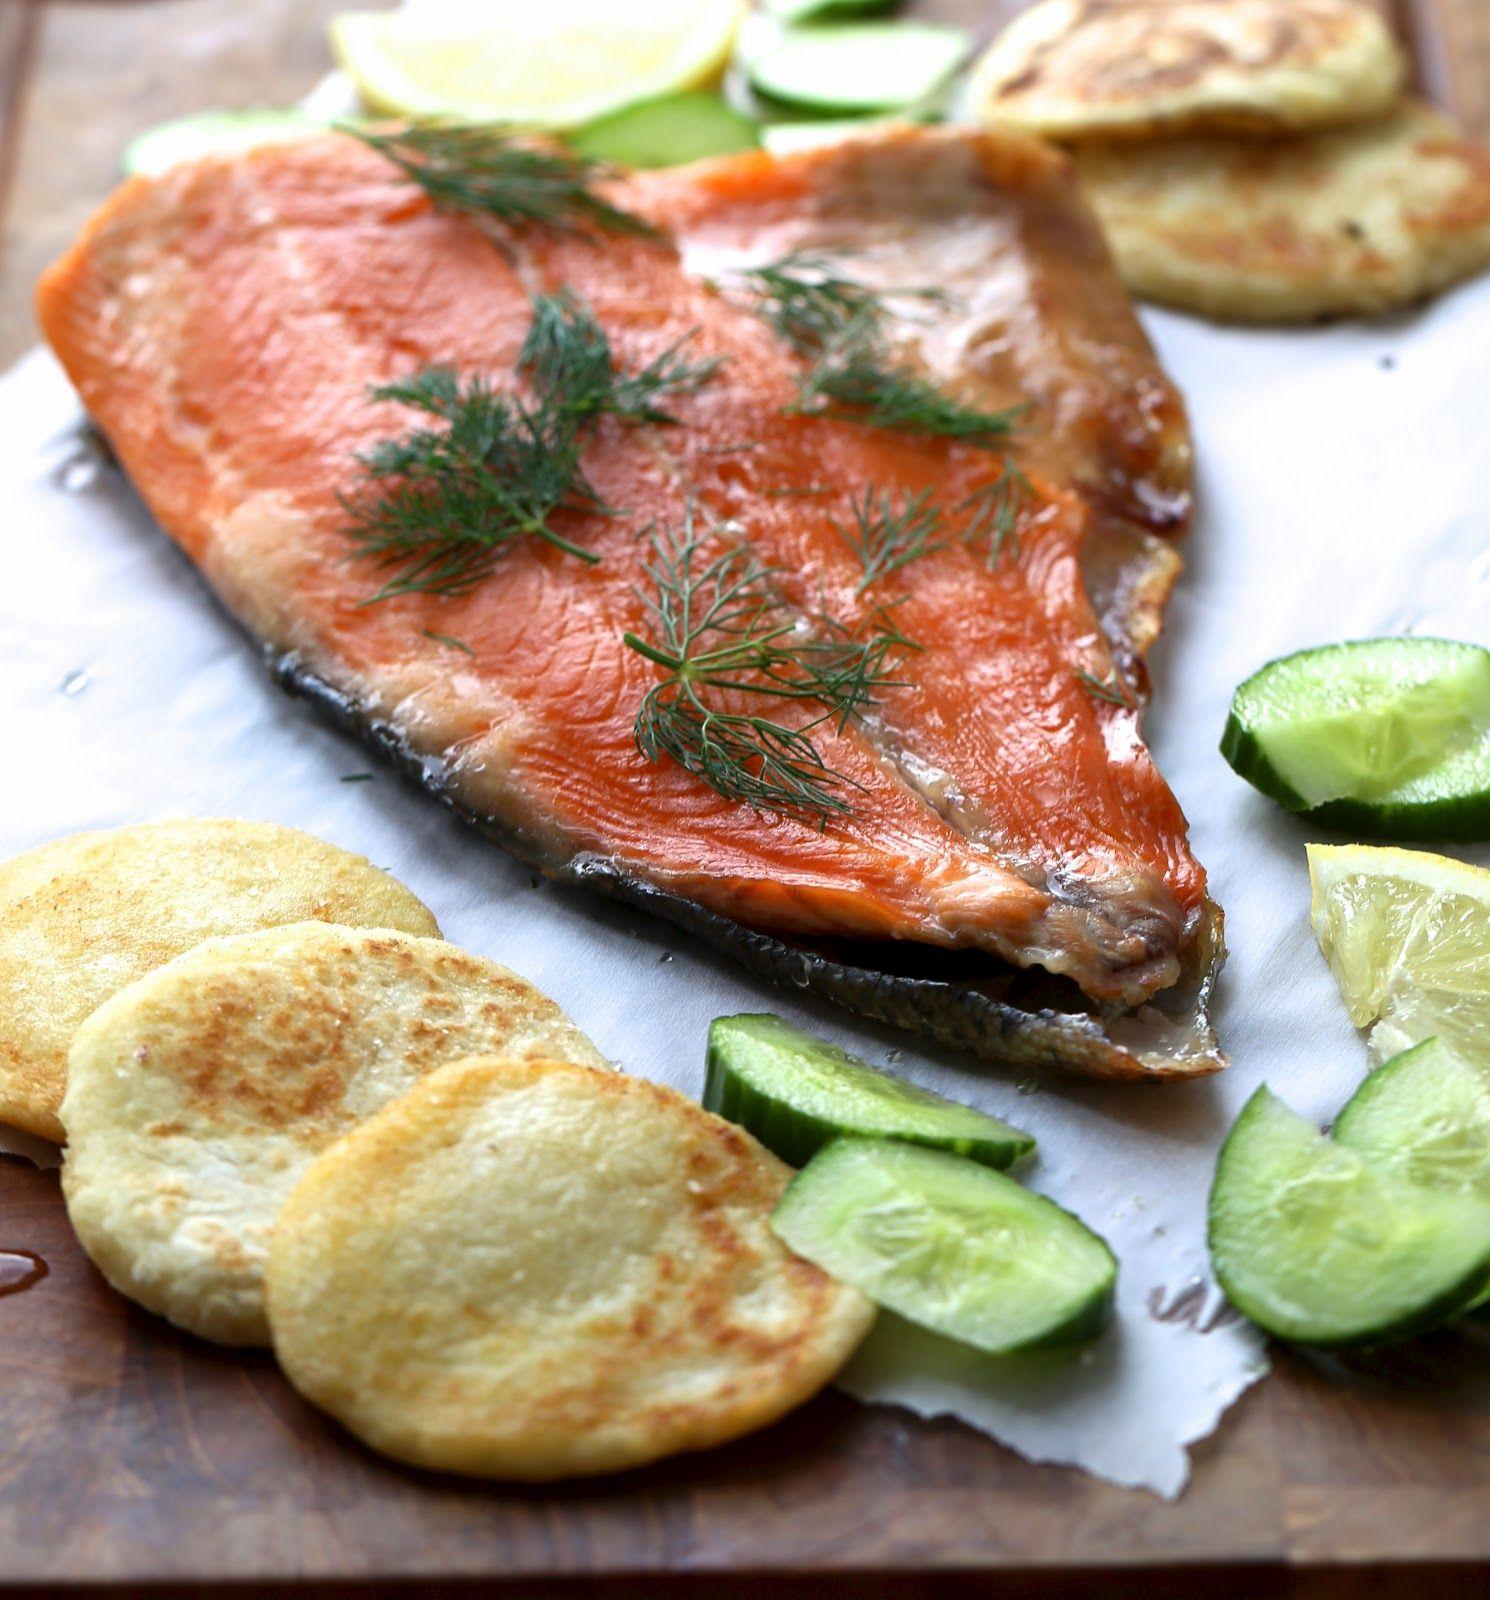 Blog de recettes de cuisine rapide facile gourmande créative